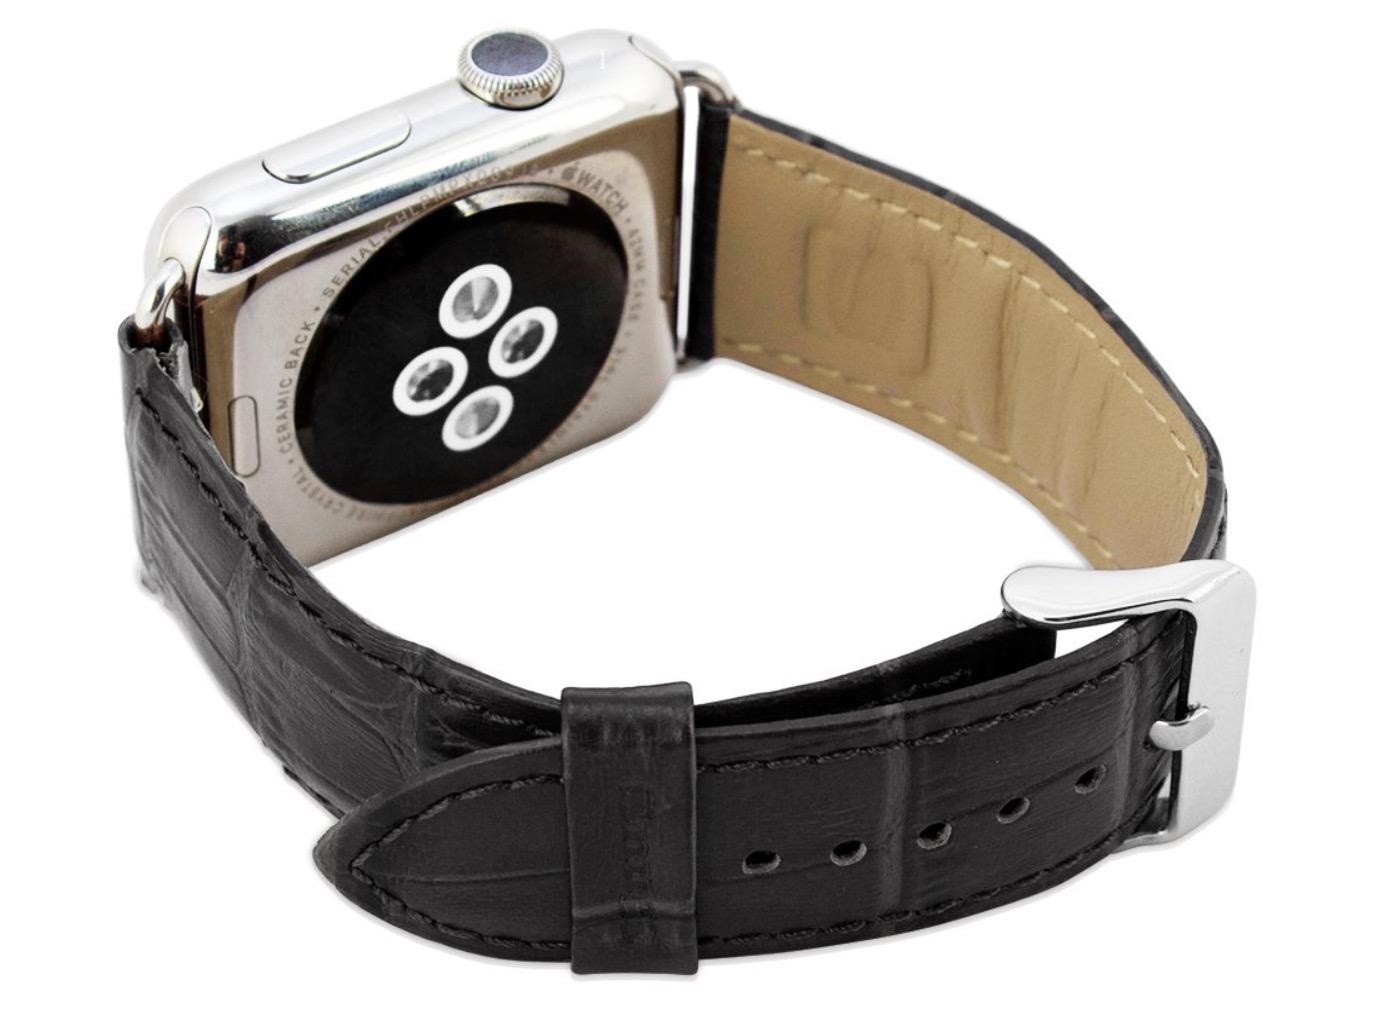 Apple Watch Snugg 3